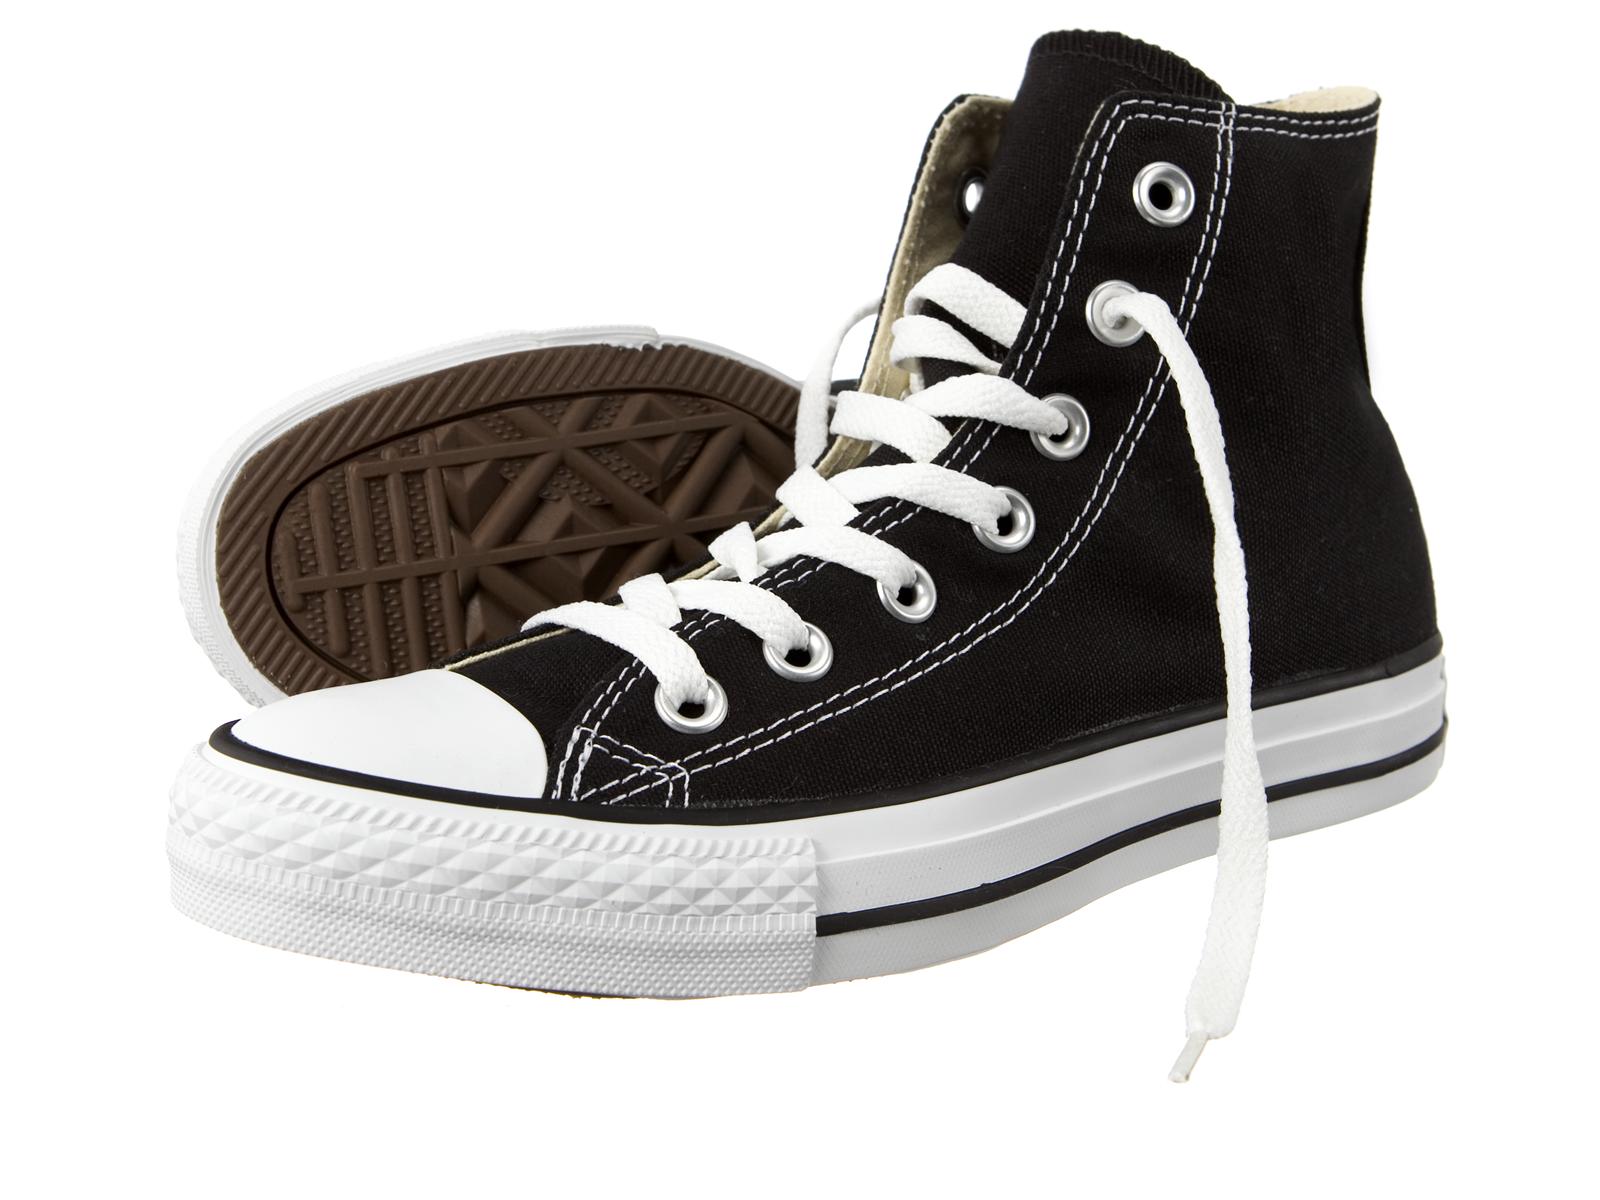 Converse Chuck Taylor All Star Hi Scarpe MANDRINI Uomo Sneaker donna vari